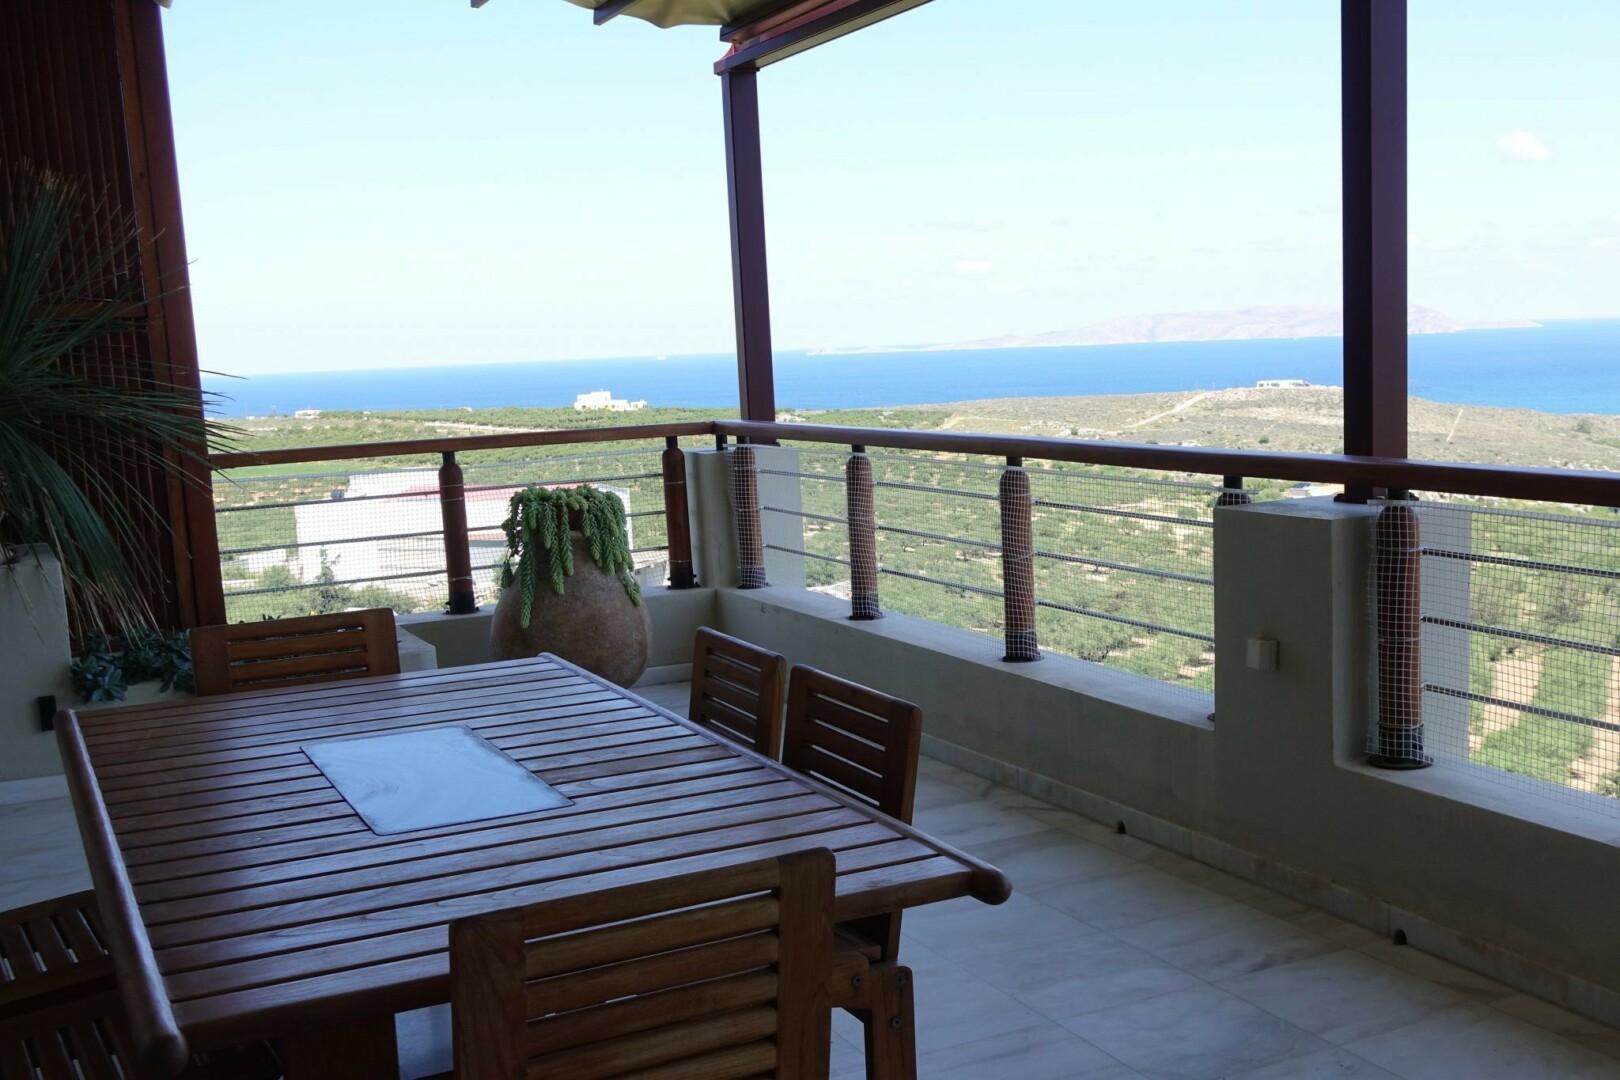 Superbe Maison H 233 Raklion Cr 232 Te Barnes Greece